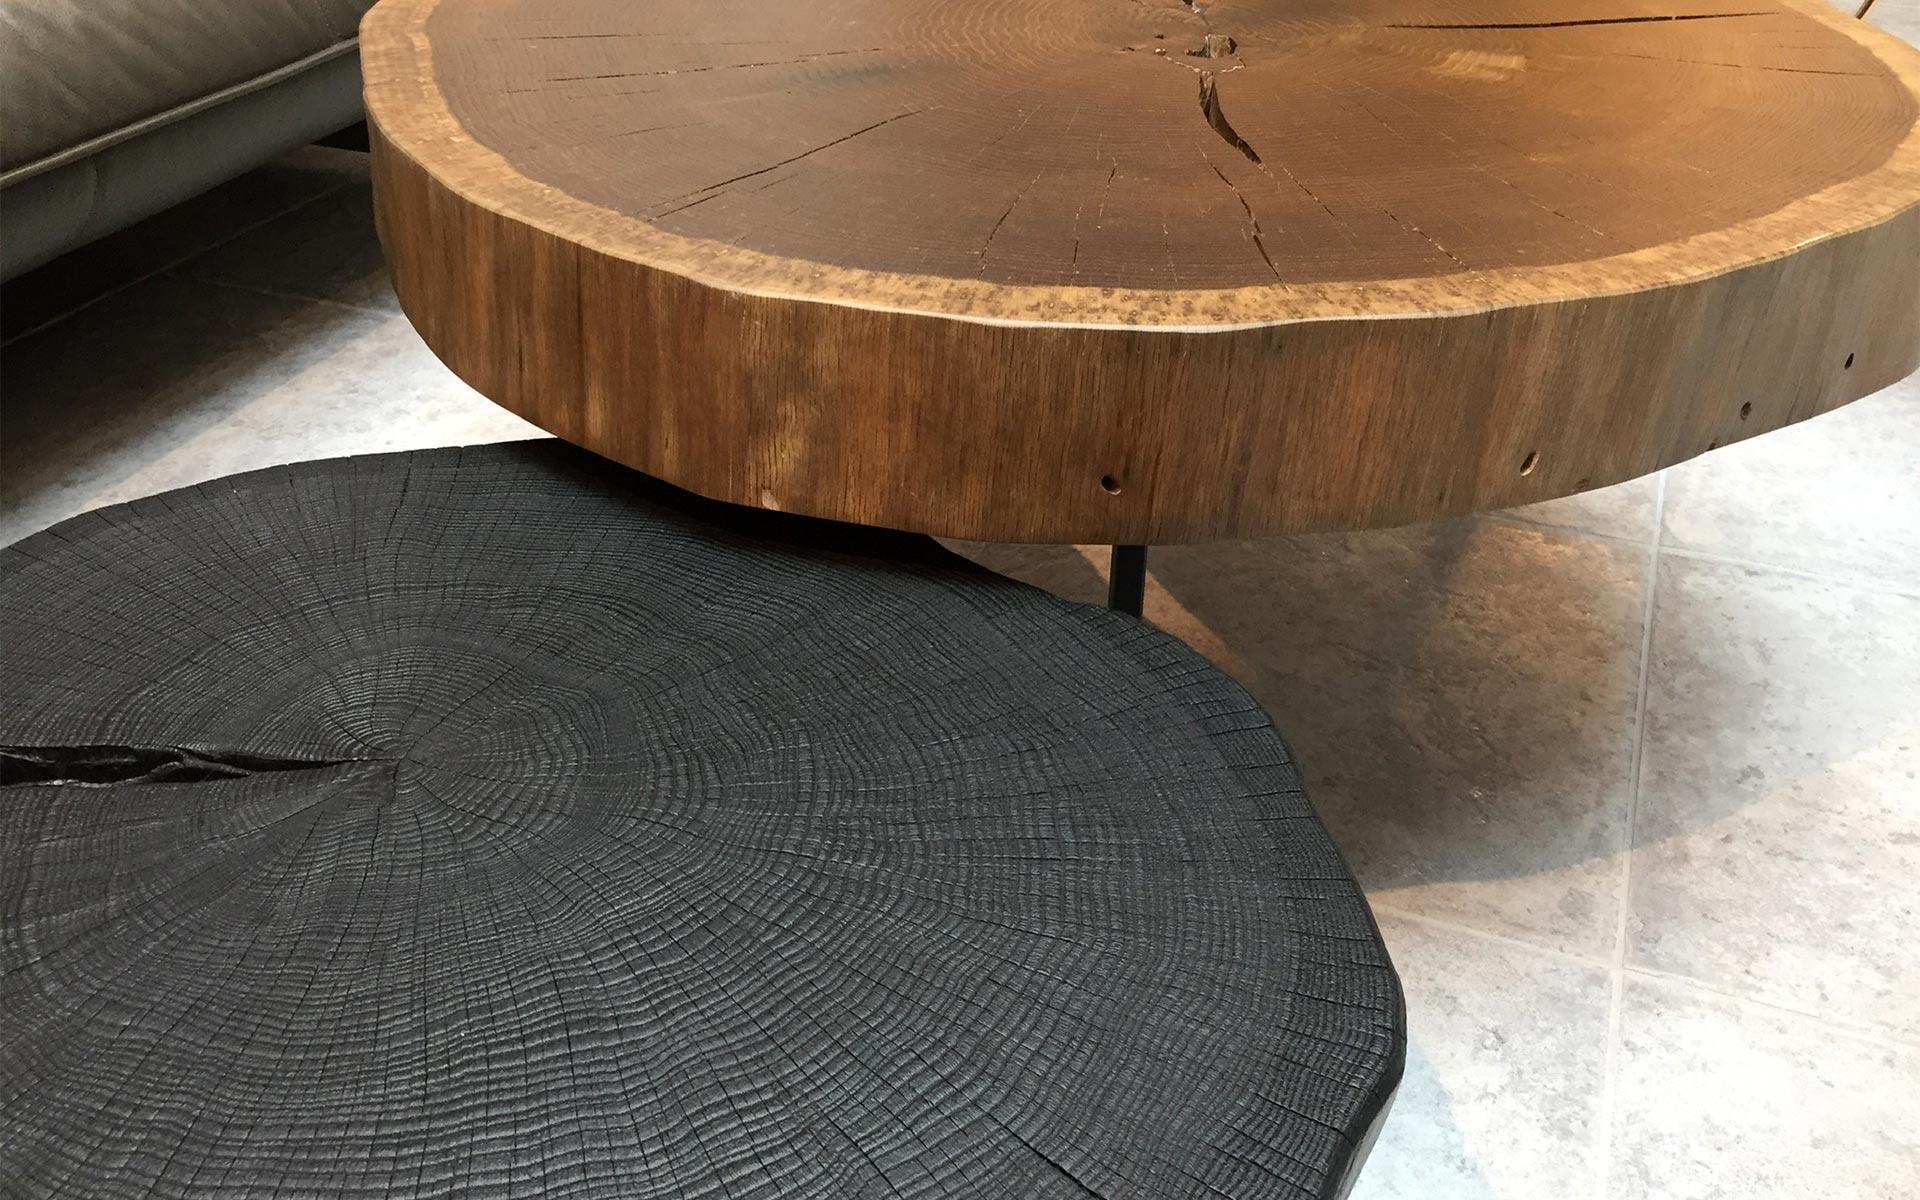 Janua Stomp Coffeetable - Interiordesign steidten+ Berlin